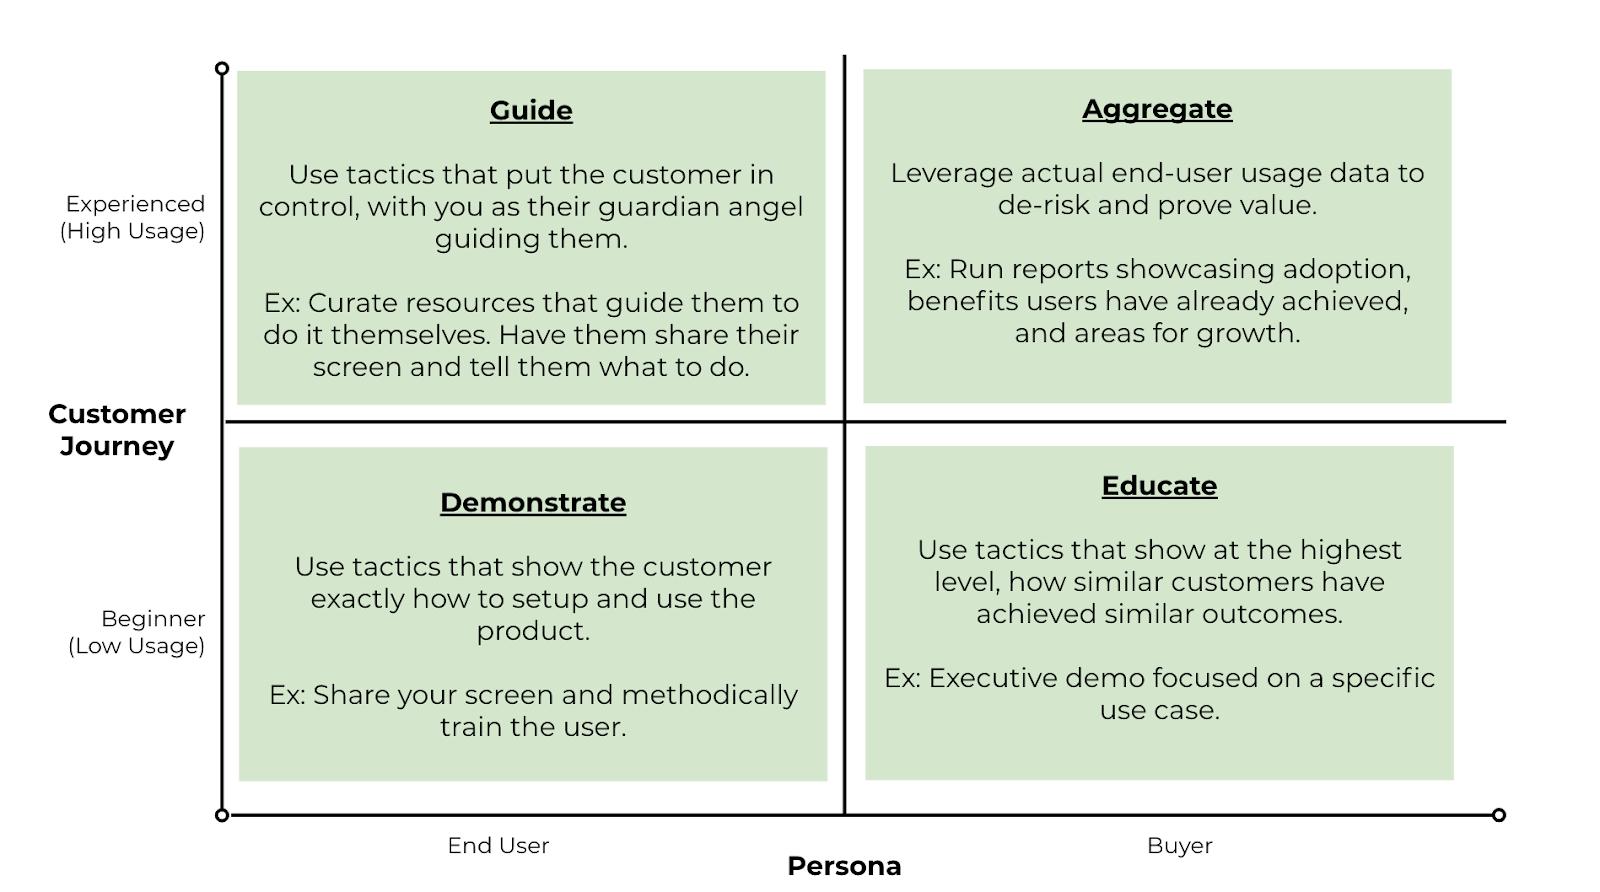 Tactics for eliminating friction based on Persona and Customer Journey Phase